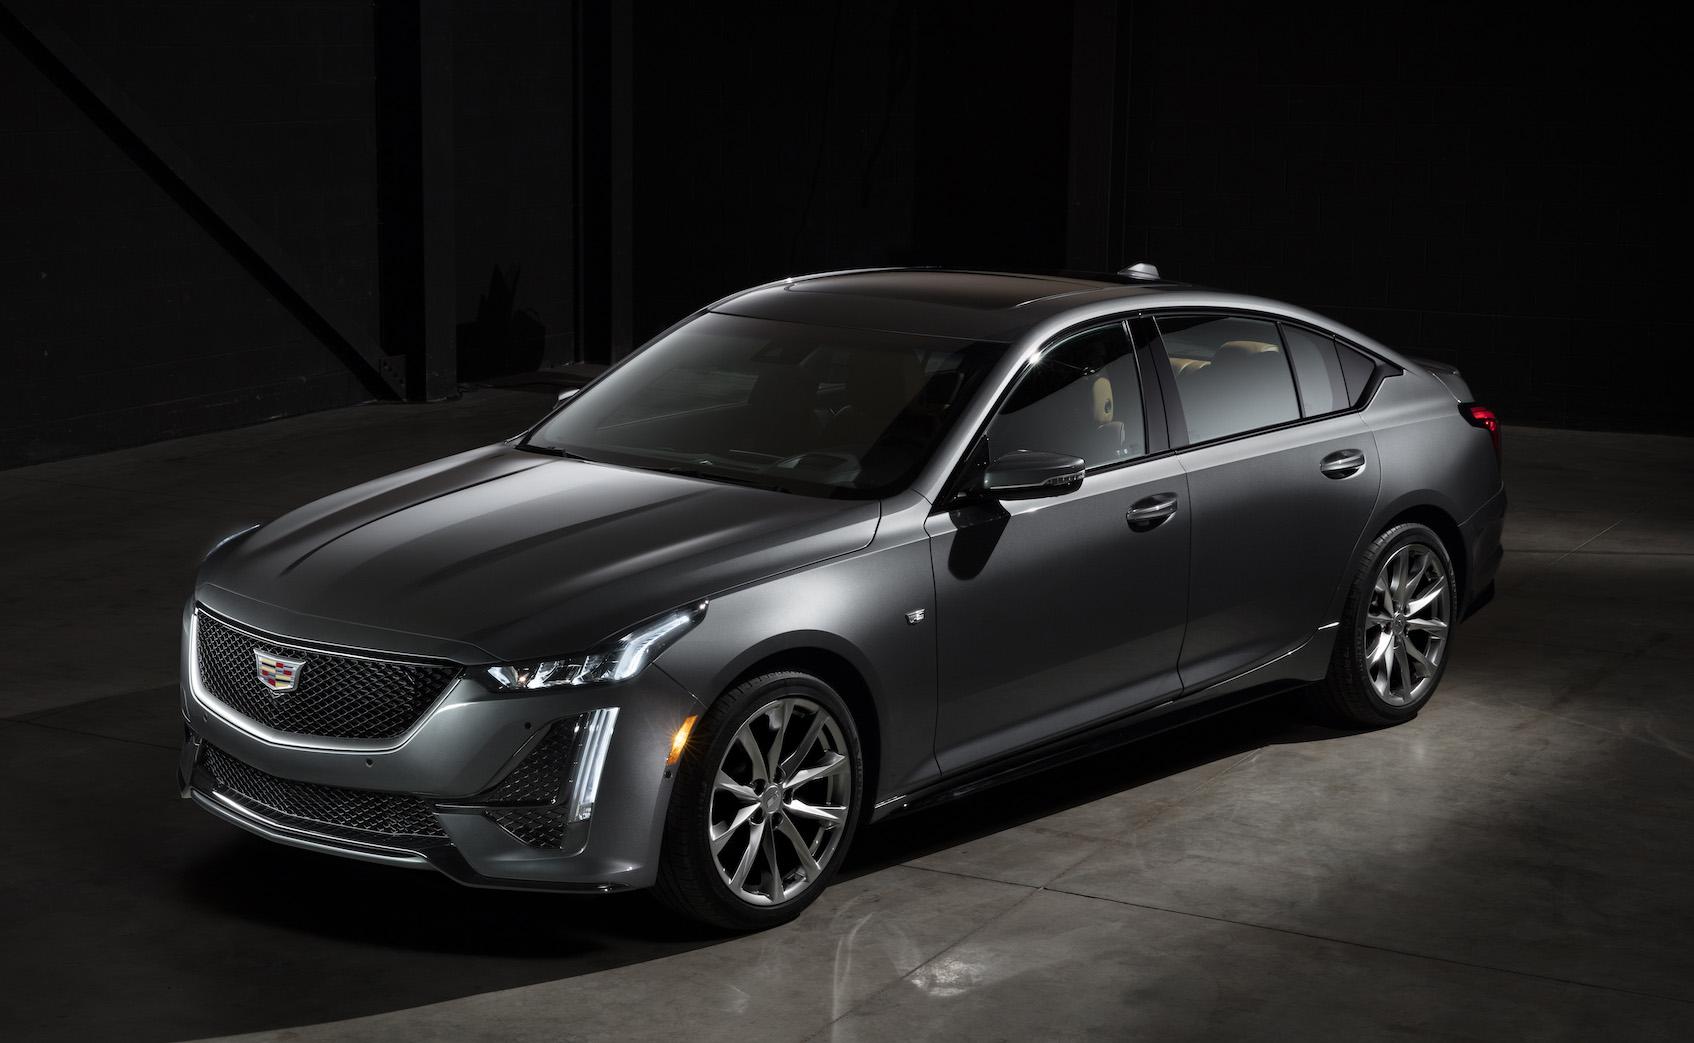 A silver 2020 Cadillac CT5, a midsize four-door luxury sports sedan.